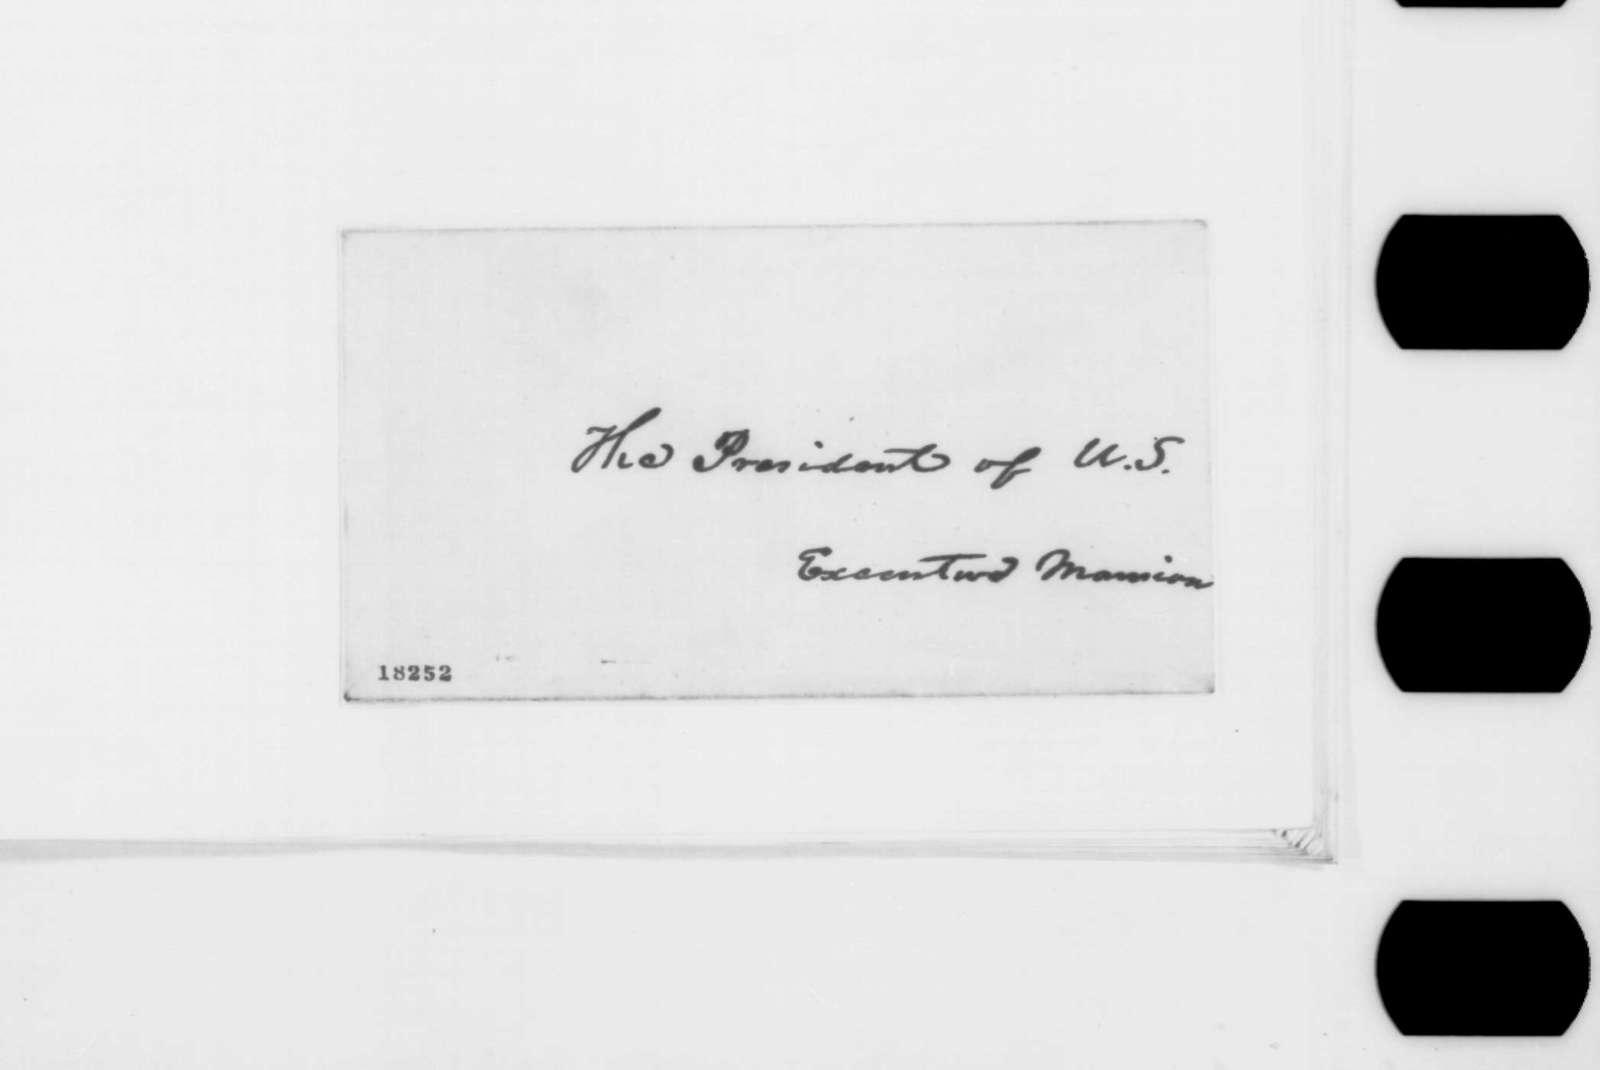 Garrett Davis, John B. Huston, and Richard A. Buckner to Abraham Lincoln, Saturday, September 06, 1862  (Appreciate meeting with Lincoln)